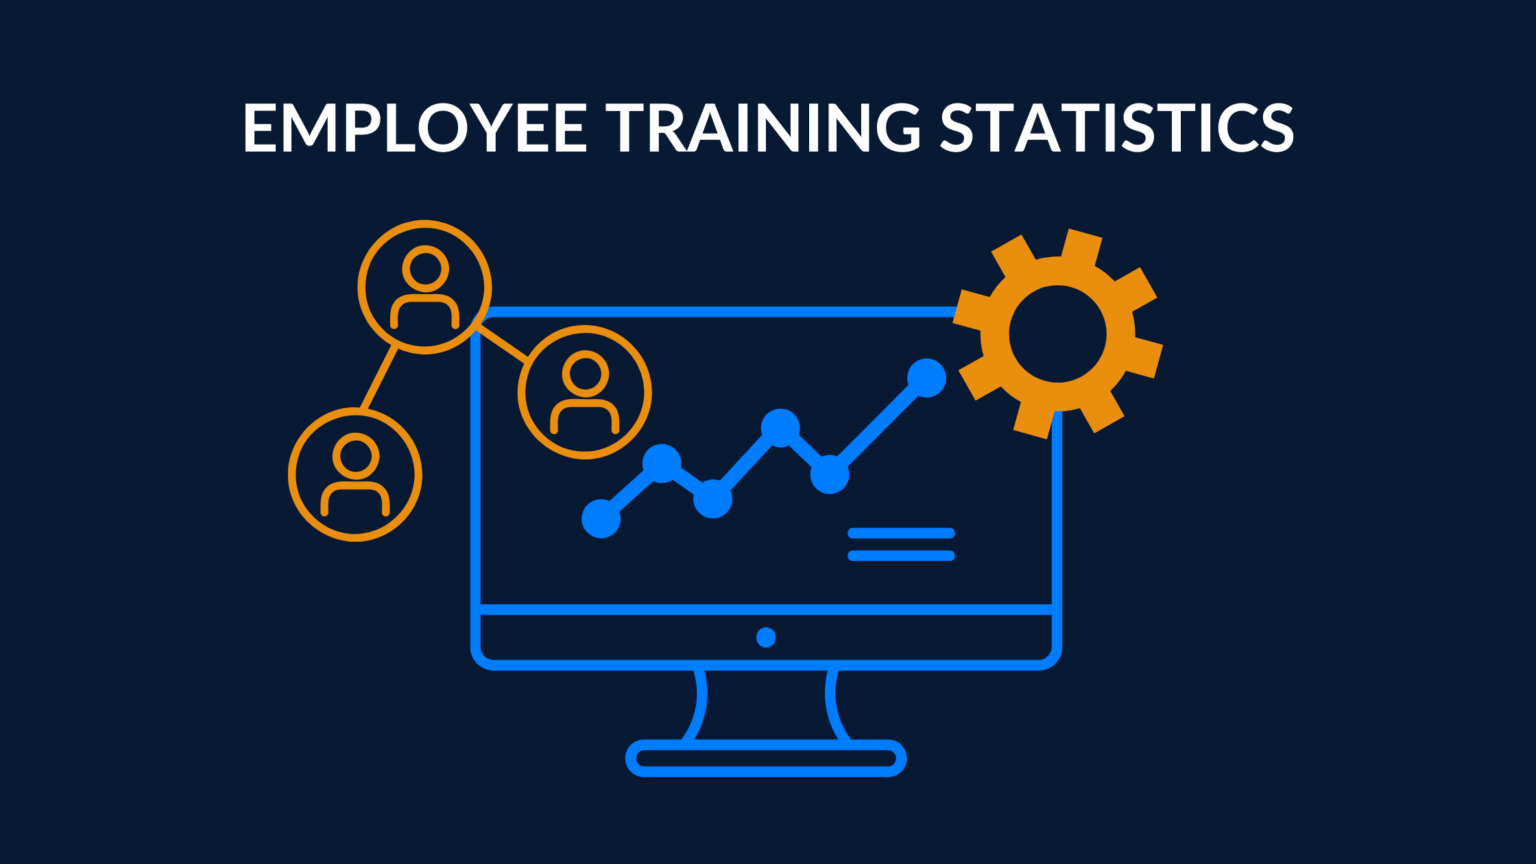 Employee Training Statistics For 2021